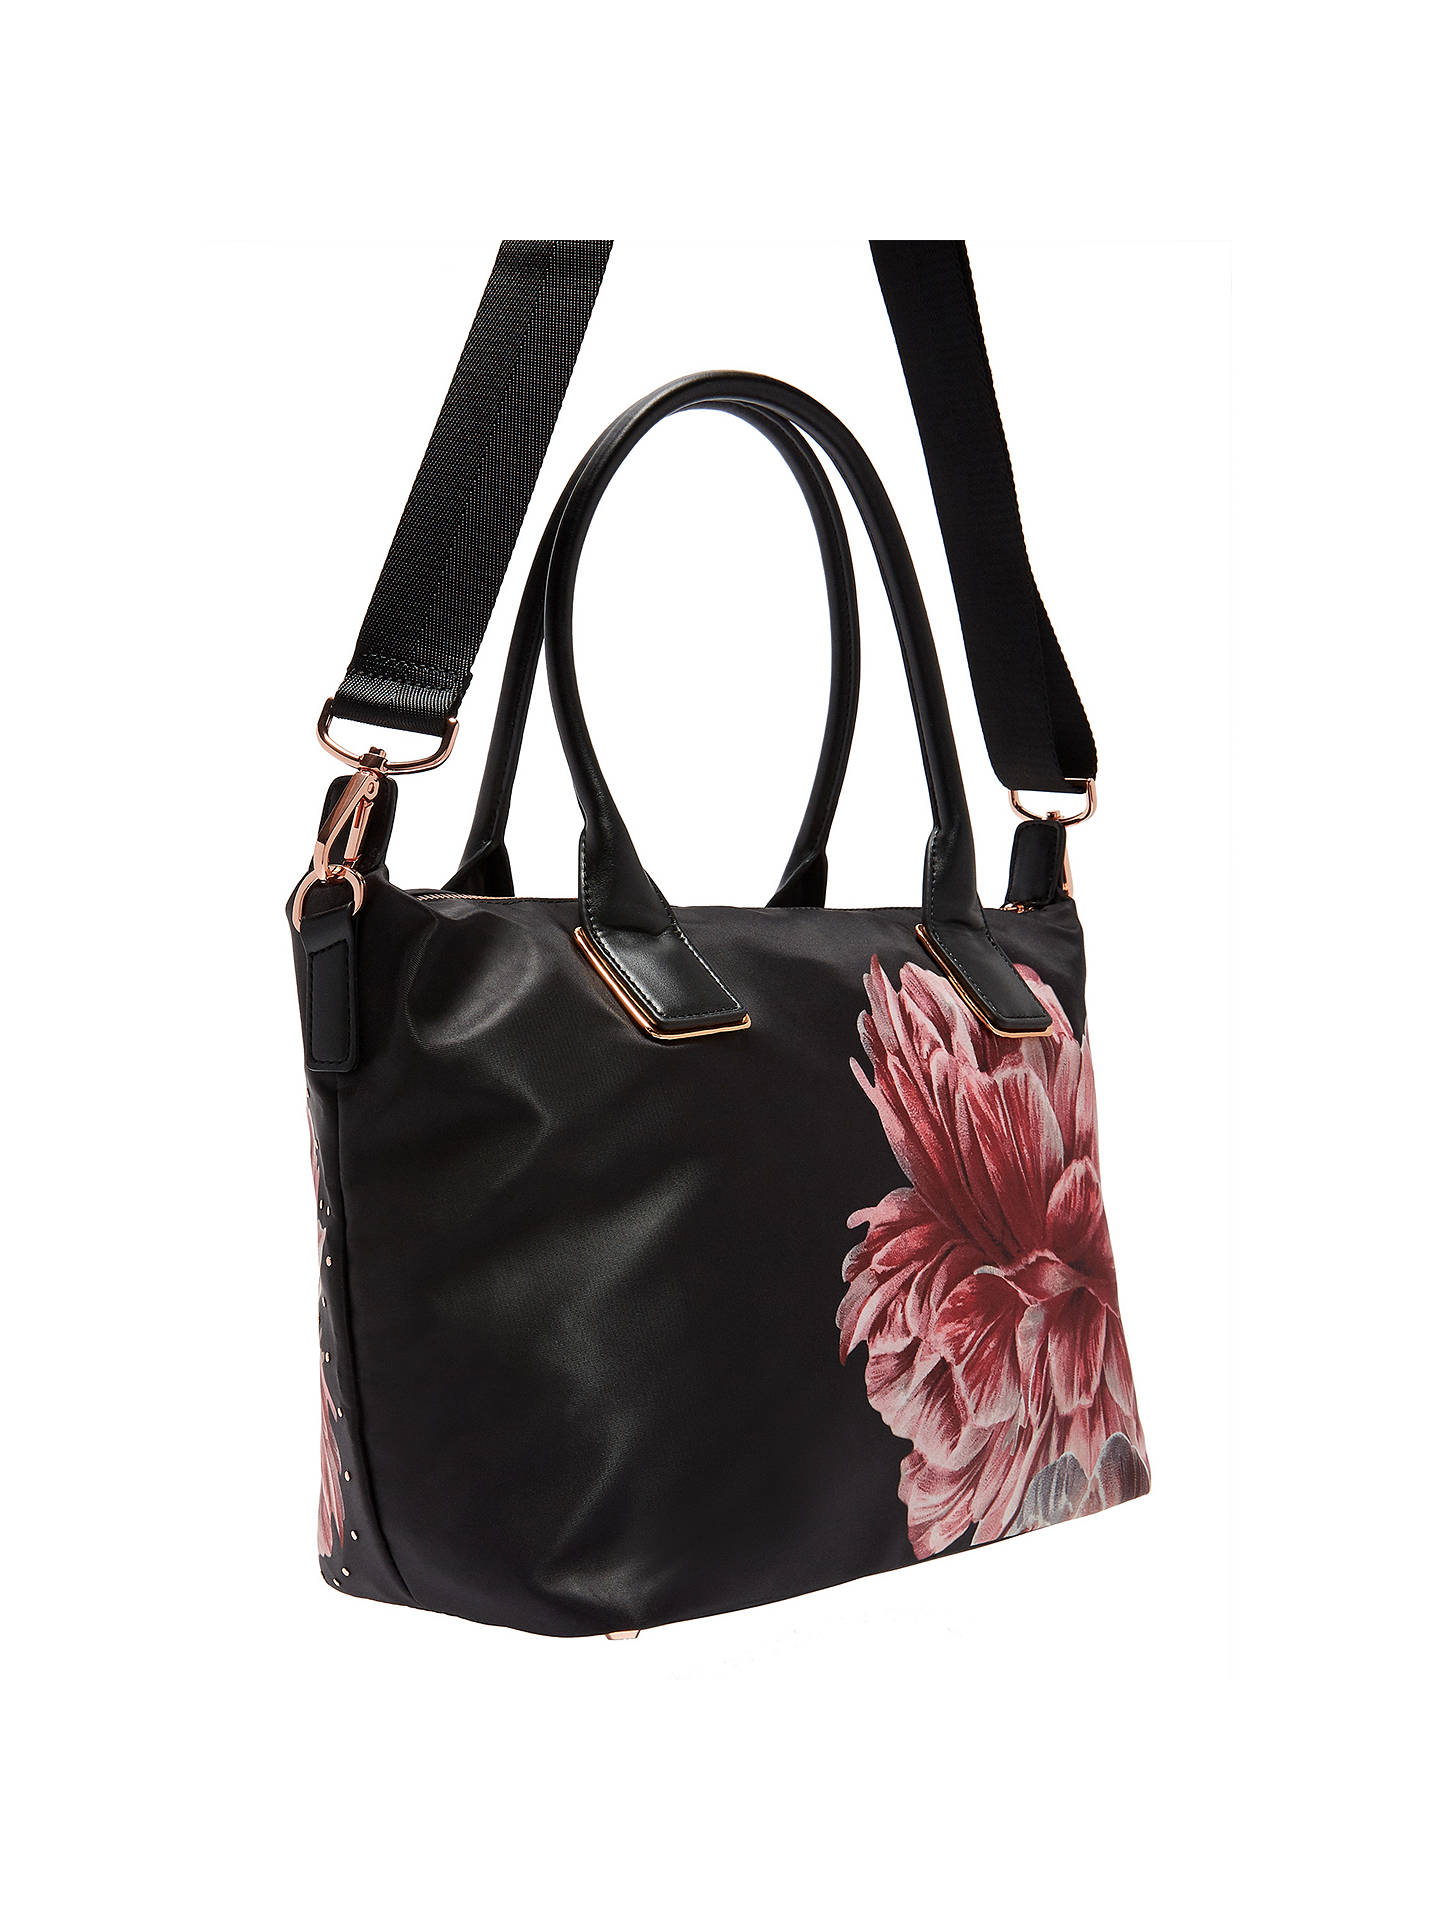 8e0df3b1b13c ... Buy Ted Baker Llisa Tranquility Small Tote Bag